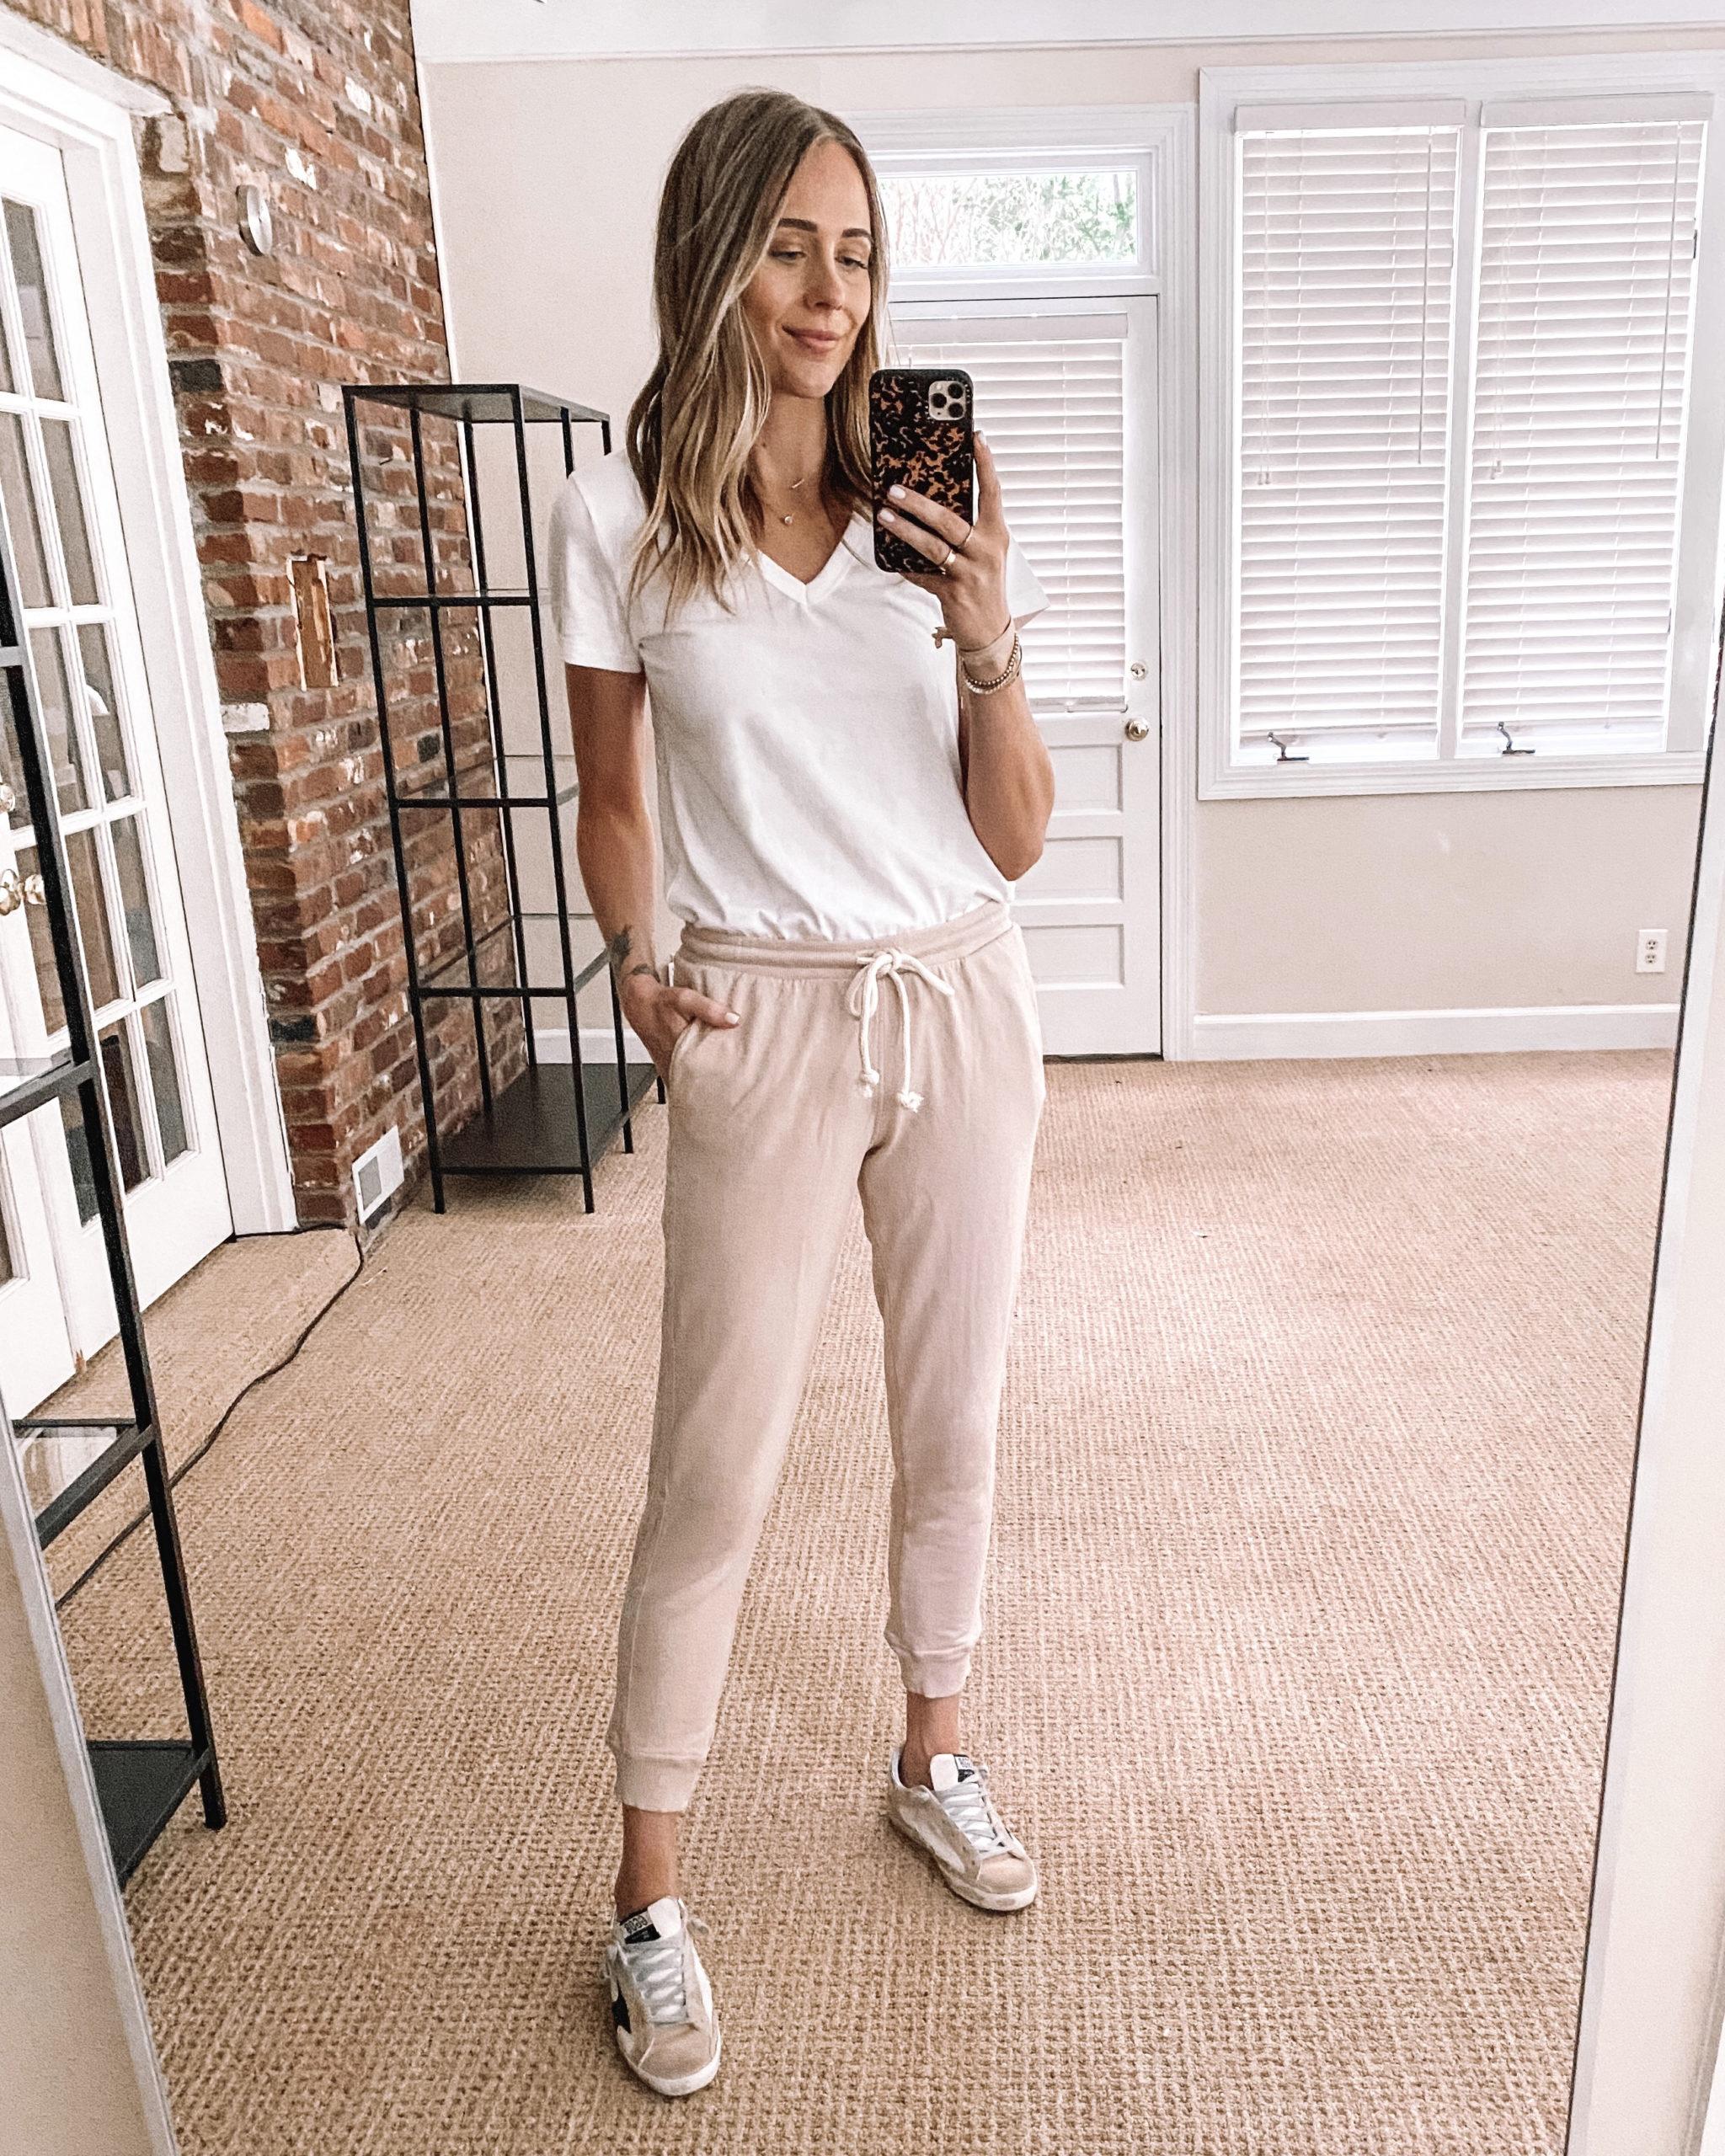 Fashion Jackson Target Finds White Vneck T-Shirt Blush Sweatpants